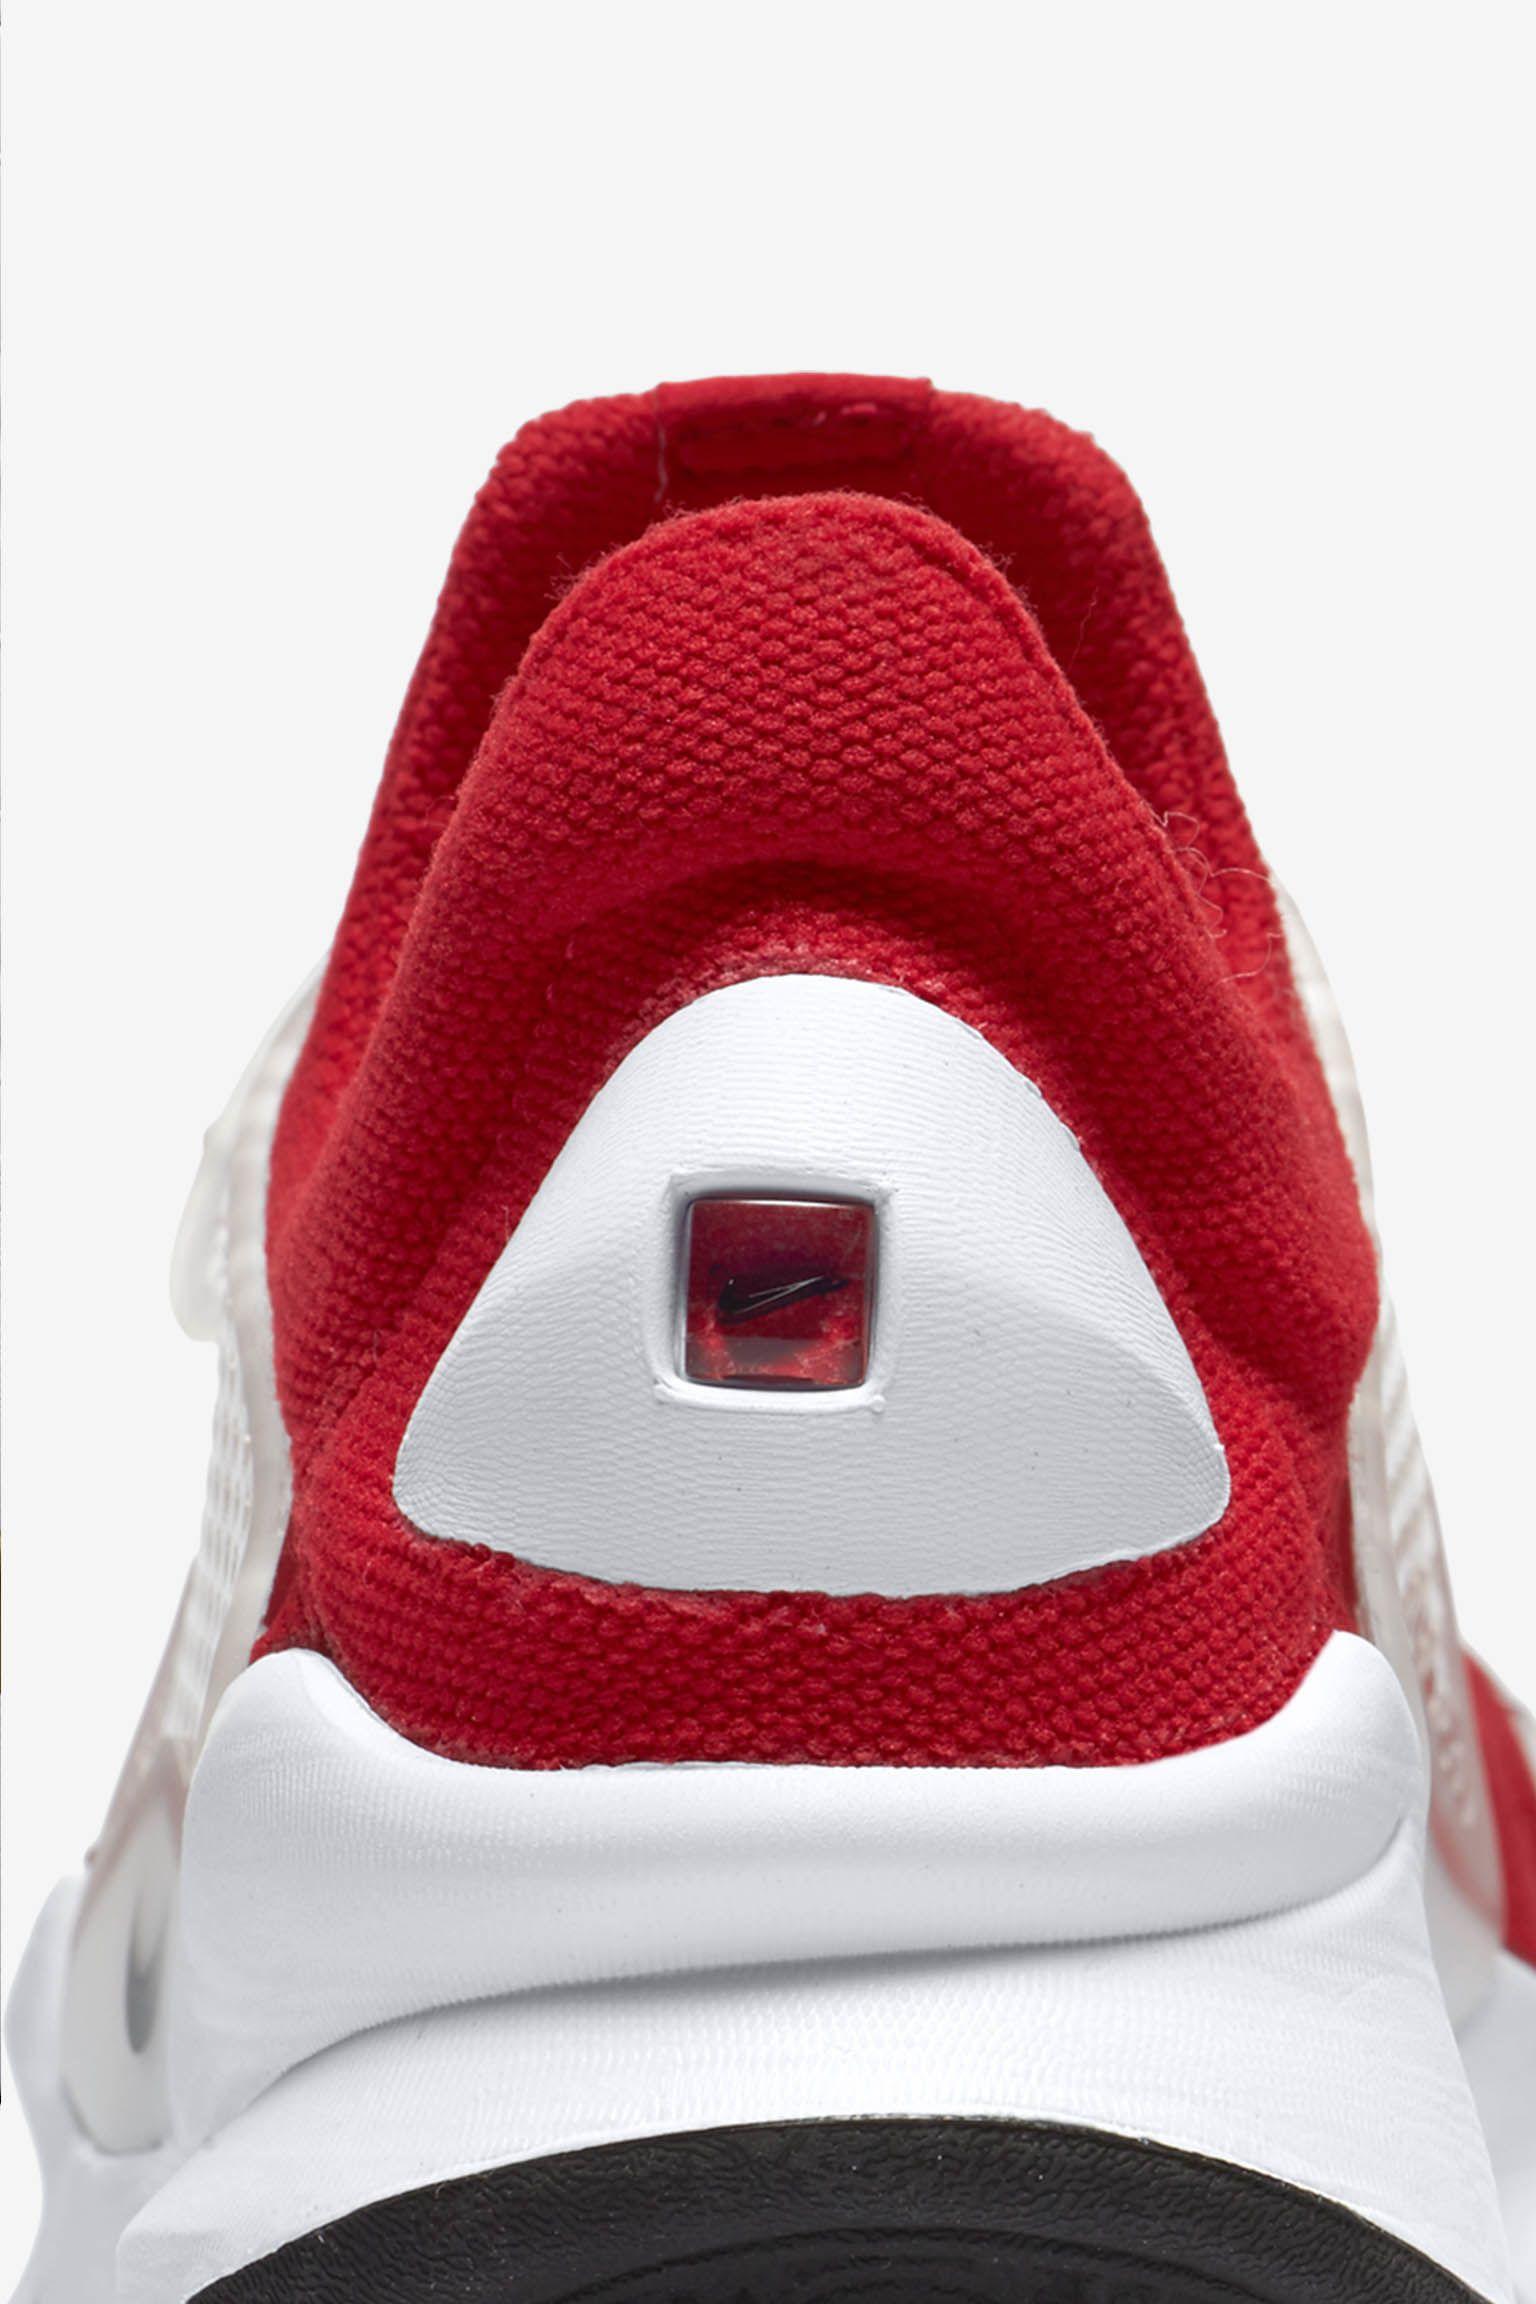 Nike Sock Dart 'Gym Red & White & Black'